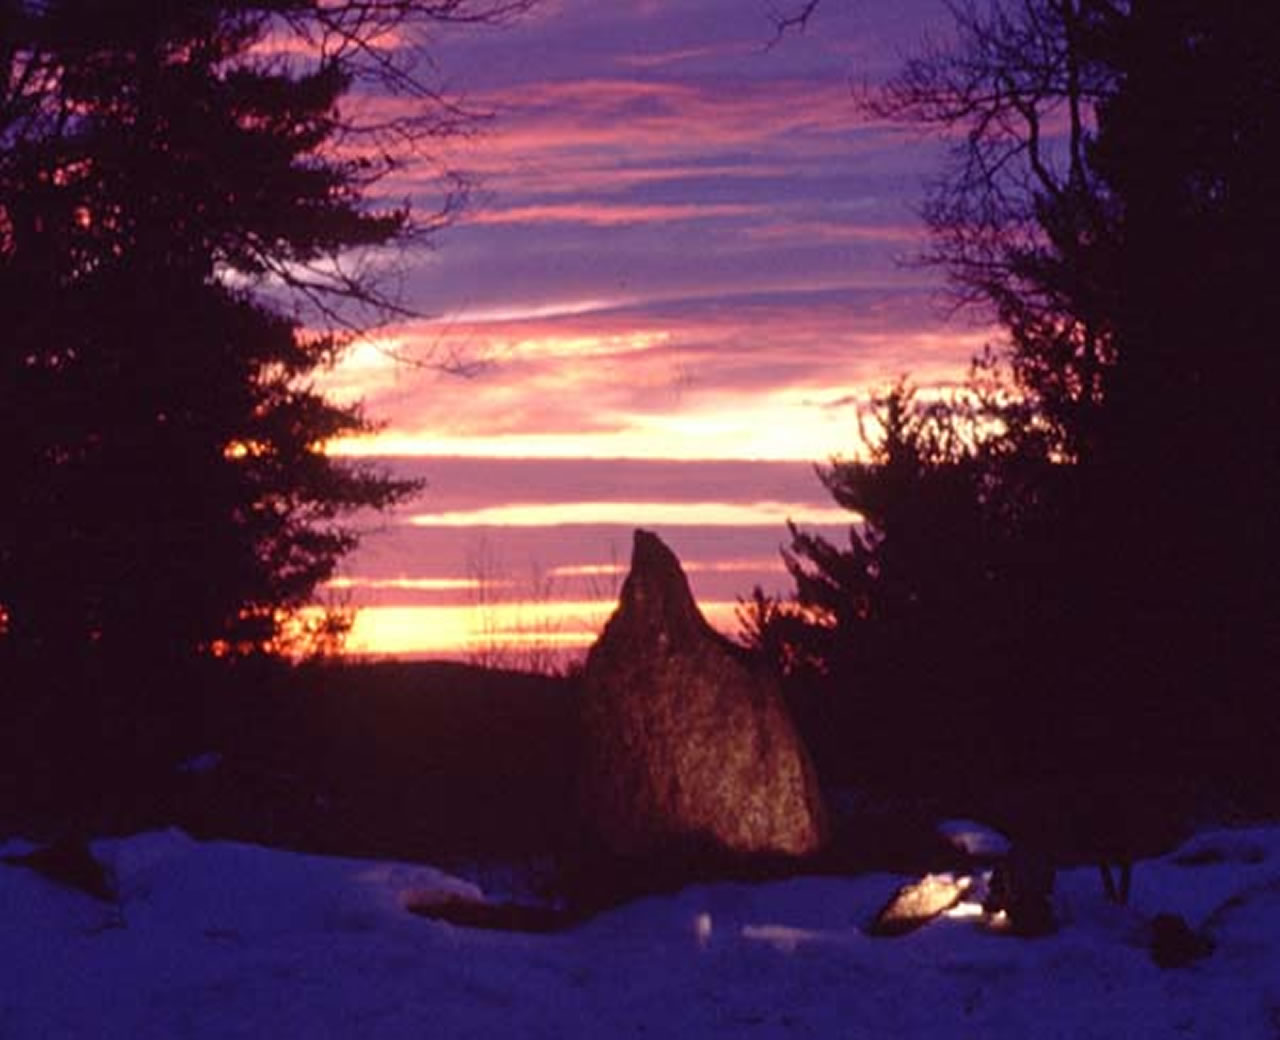 salem mystery hill winter solstice 1280x1040